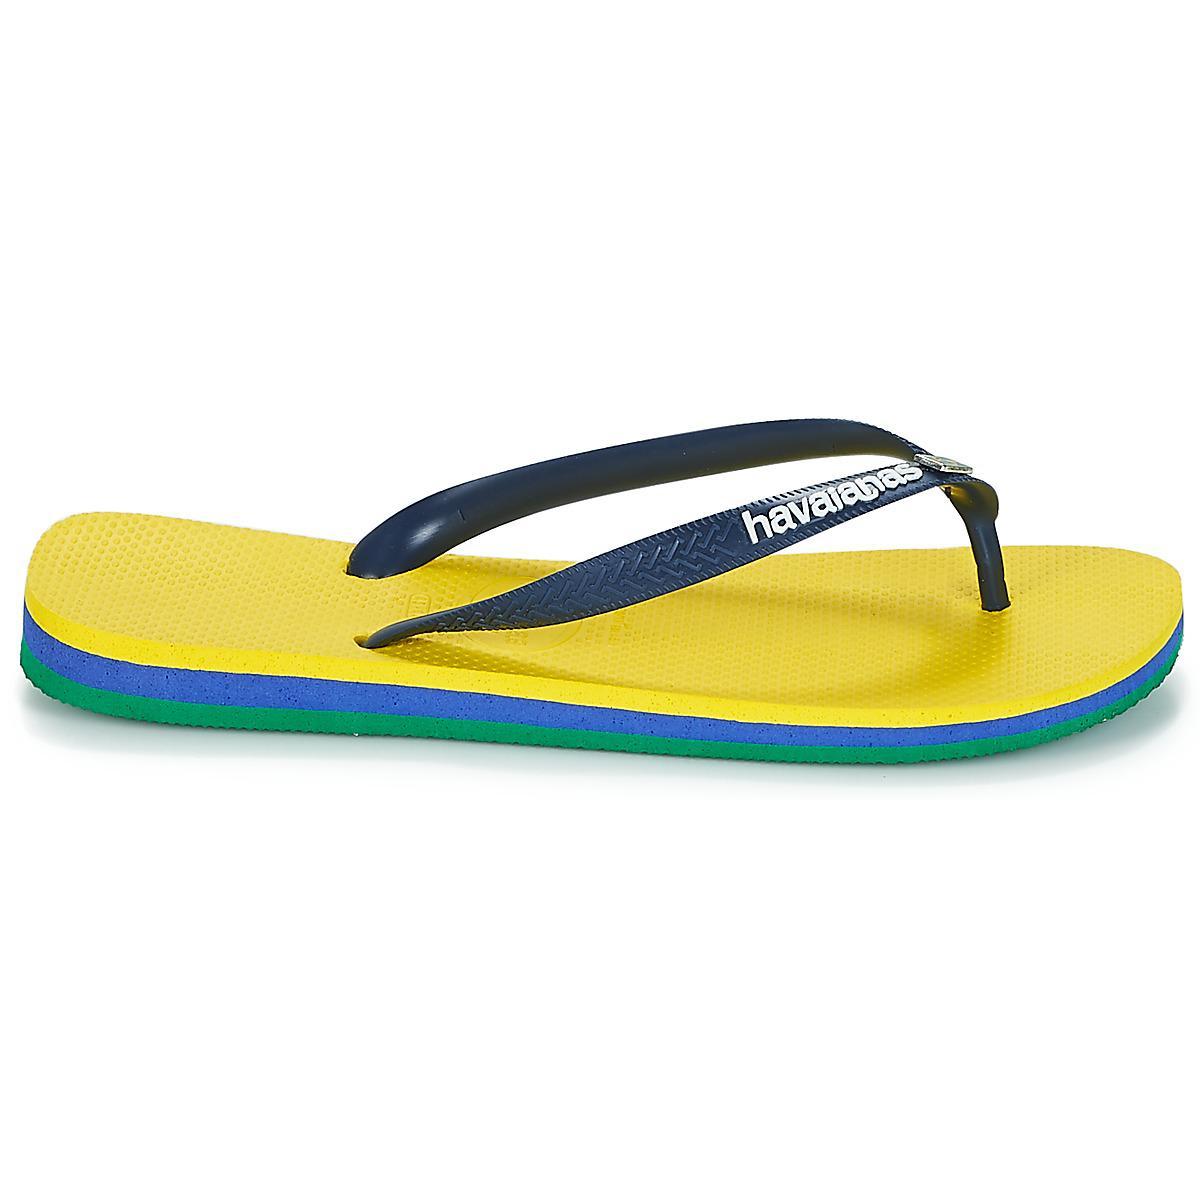 4bd81c7035edf4 Havaianas - Brasil Layers Men s Flip Flops   Sandals (shoes) In Yellow for  Men. View fullscreen